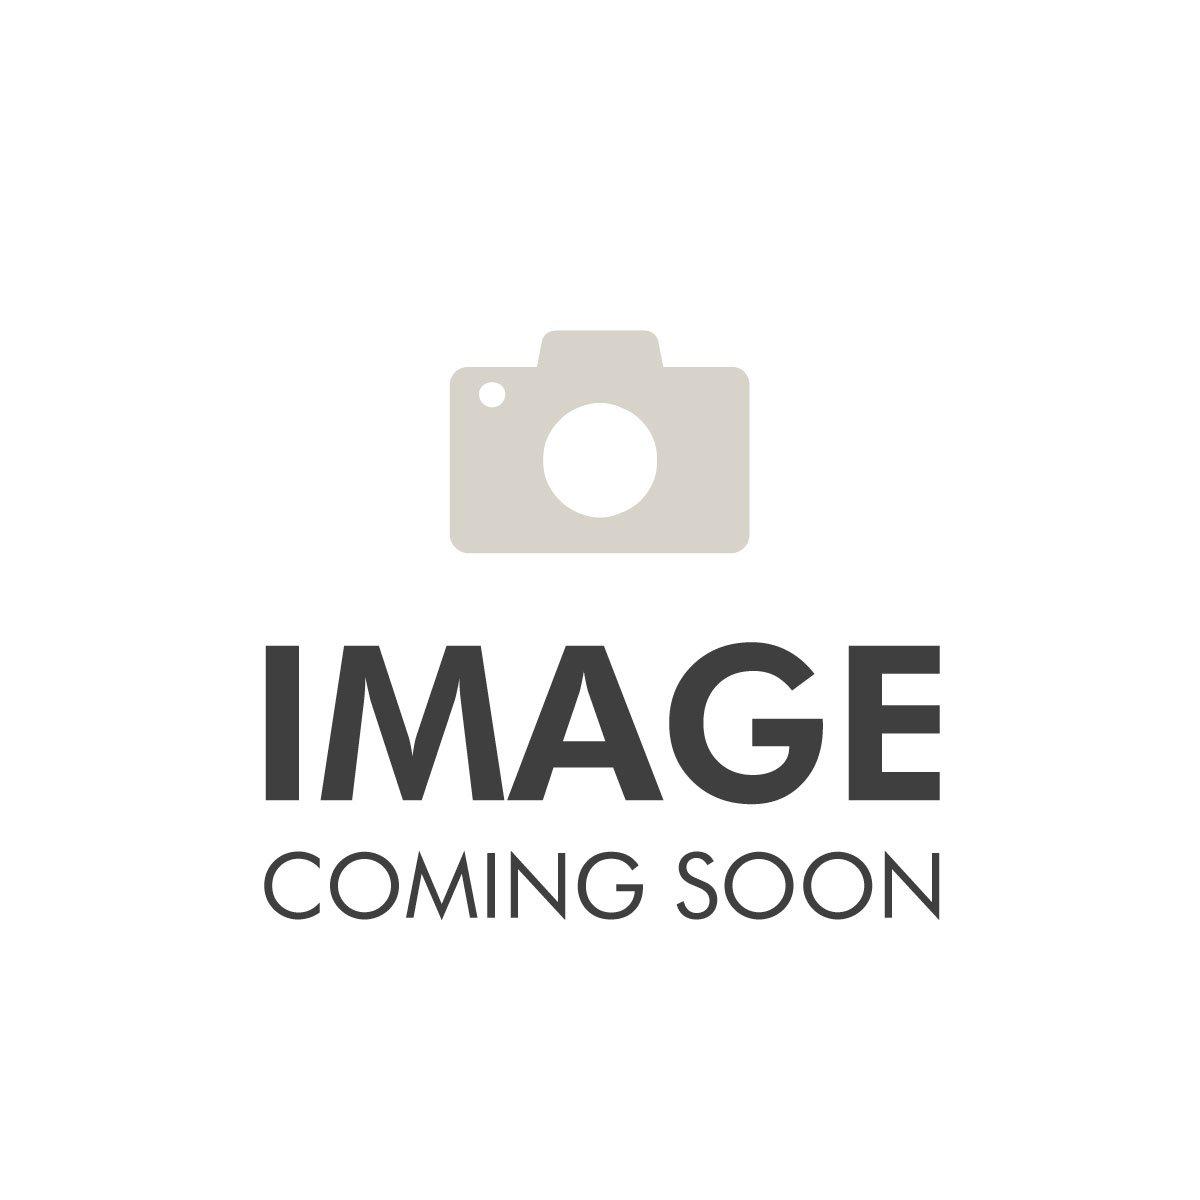 Style & Grace Style & Grace Puro Pure Bliss Bath & Body Gift Set - 8 Pieces